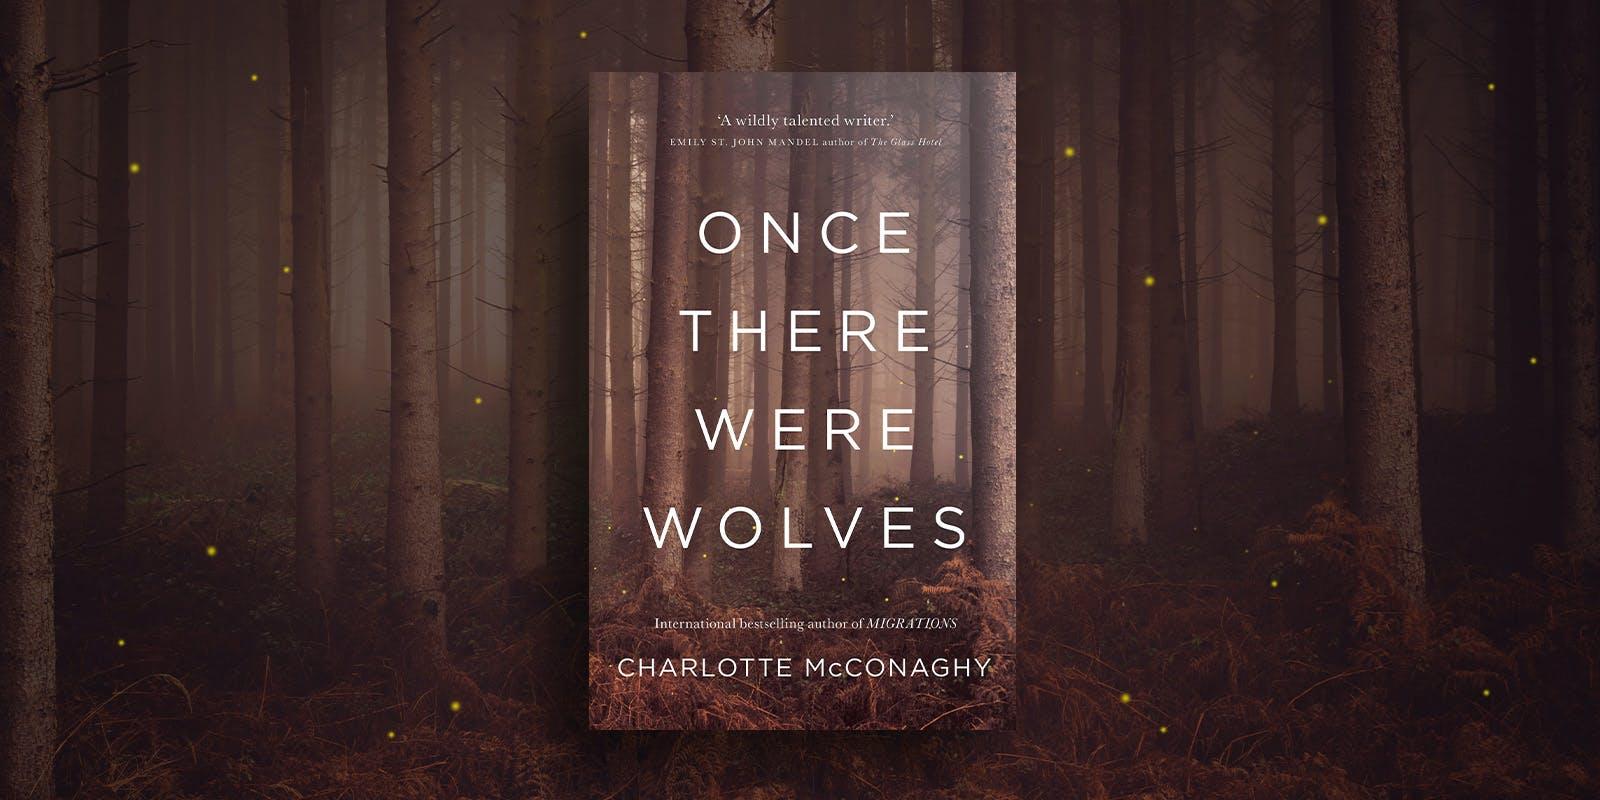 Charlotte McConaghy Q&A